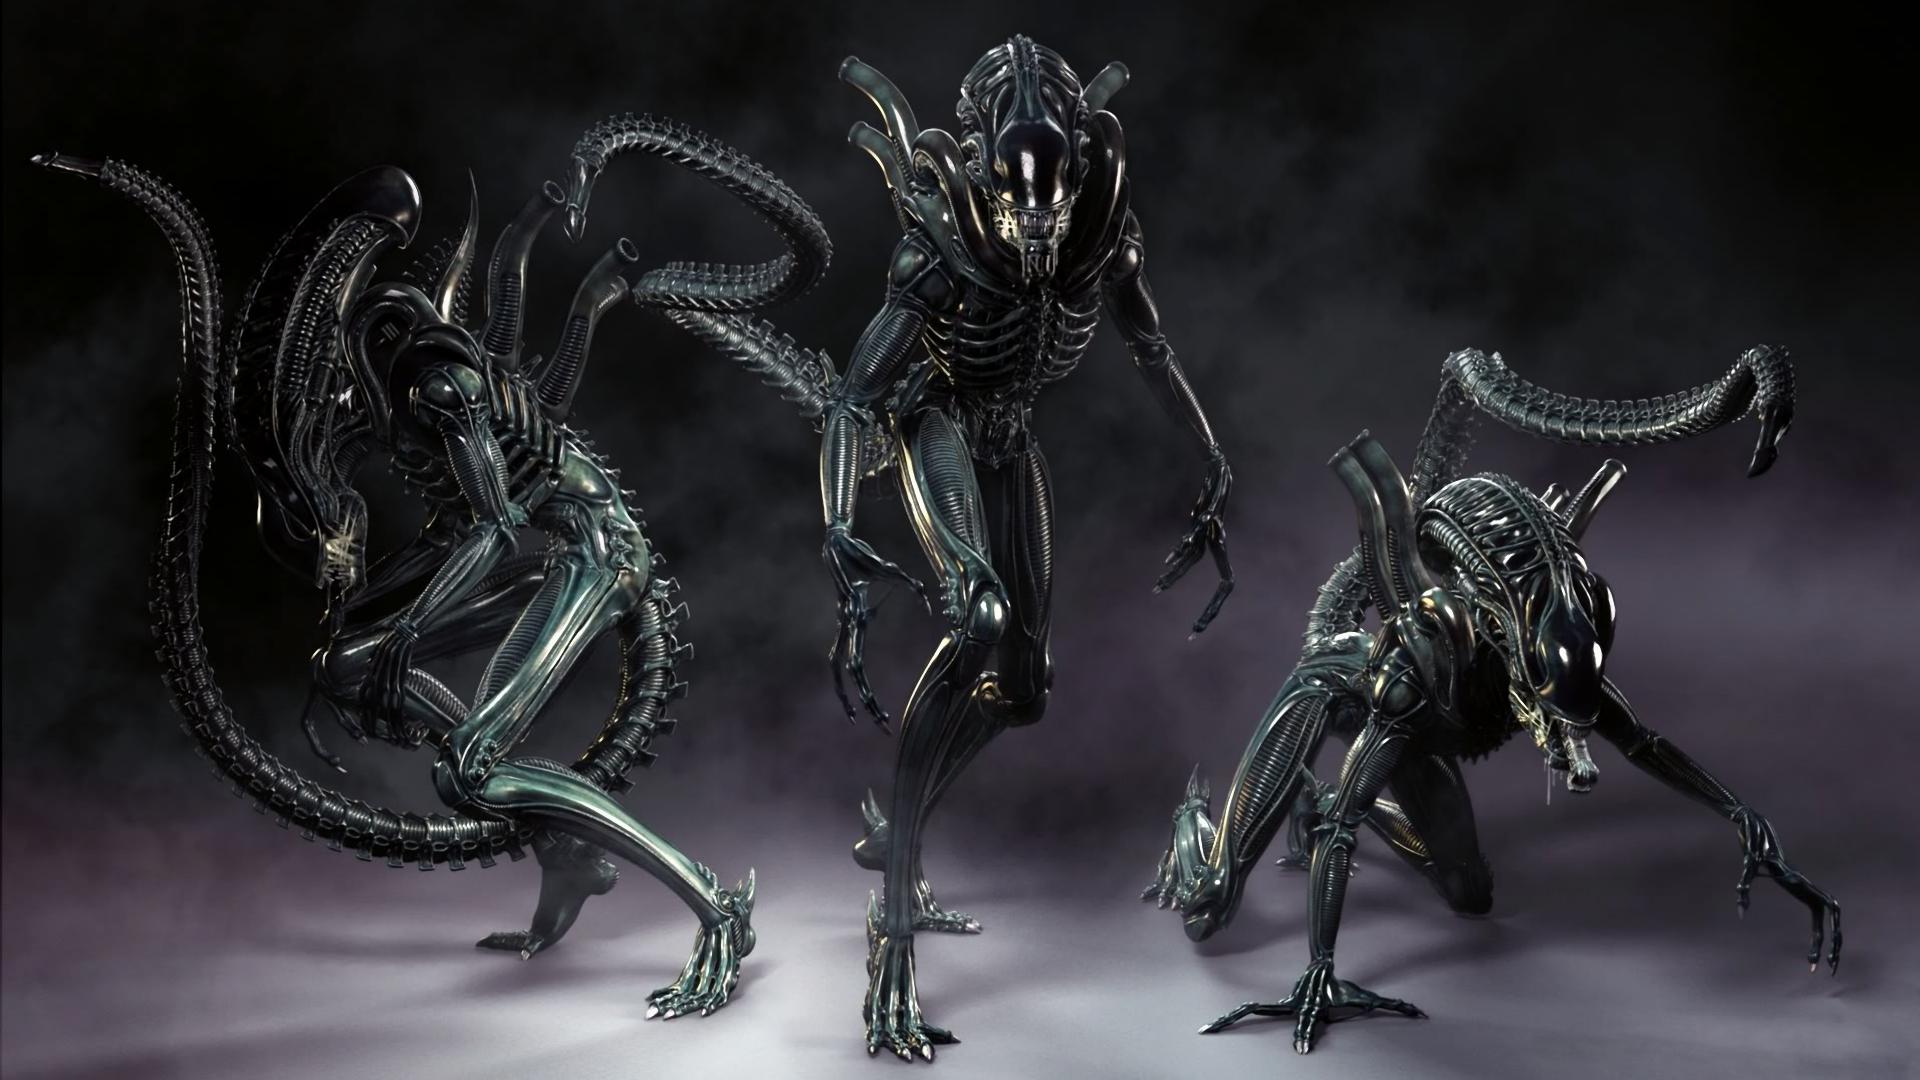 Xenomorph Alien Wallpaper 1920x1080 Xenomorph Alien Aliens 1920x1080